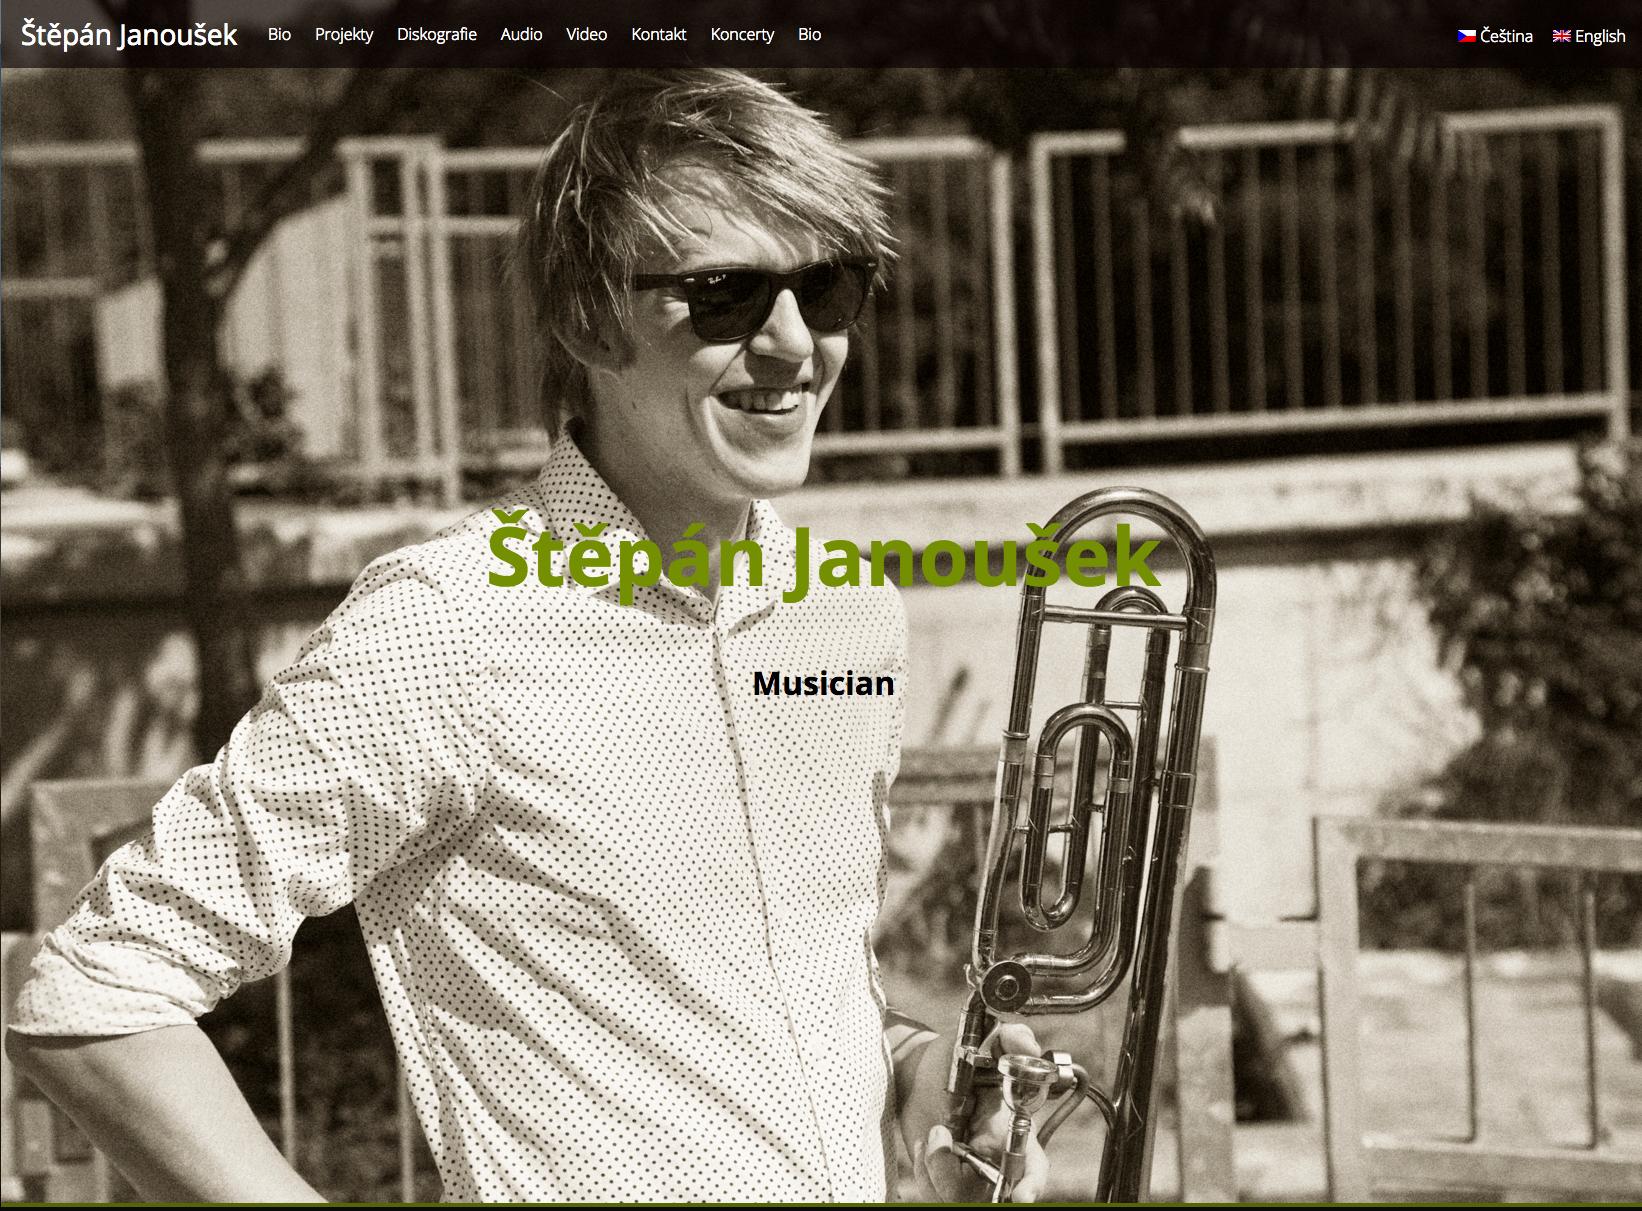 Stepan Janousek